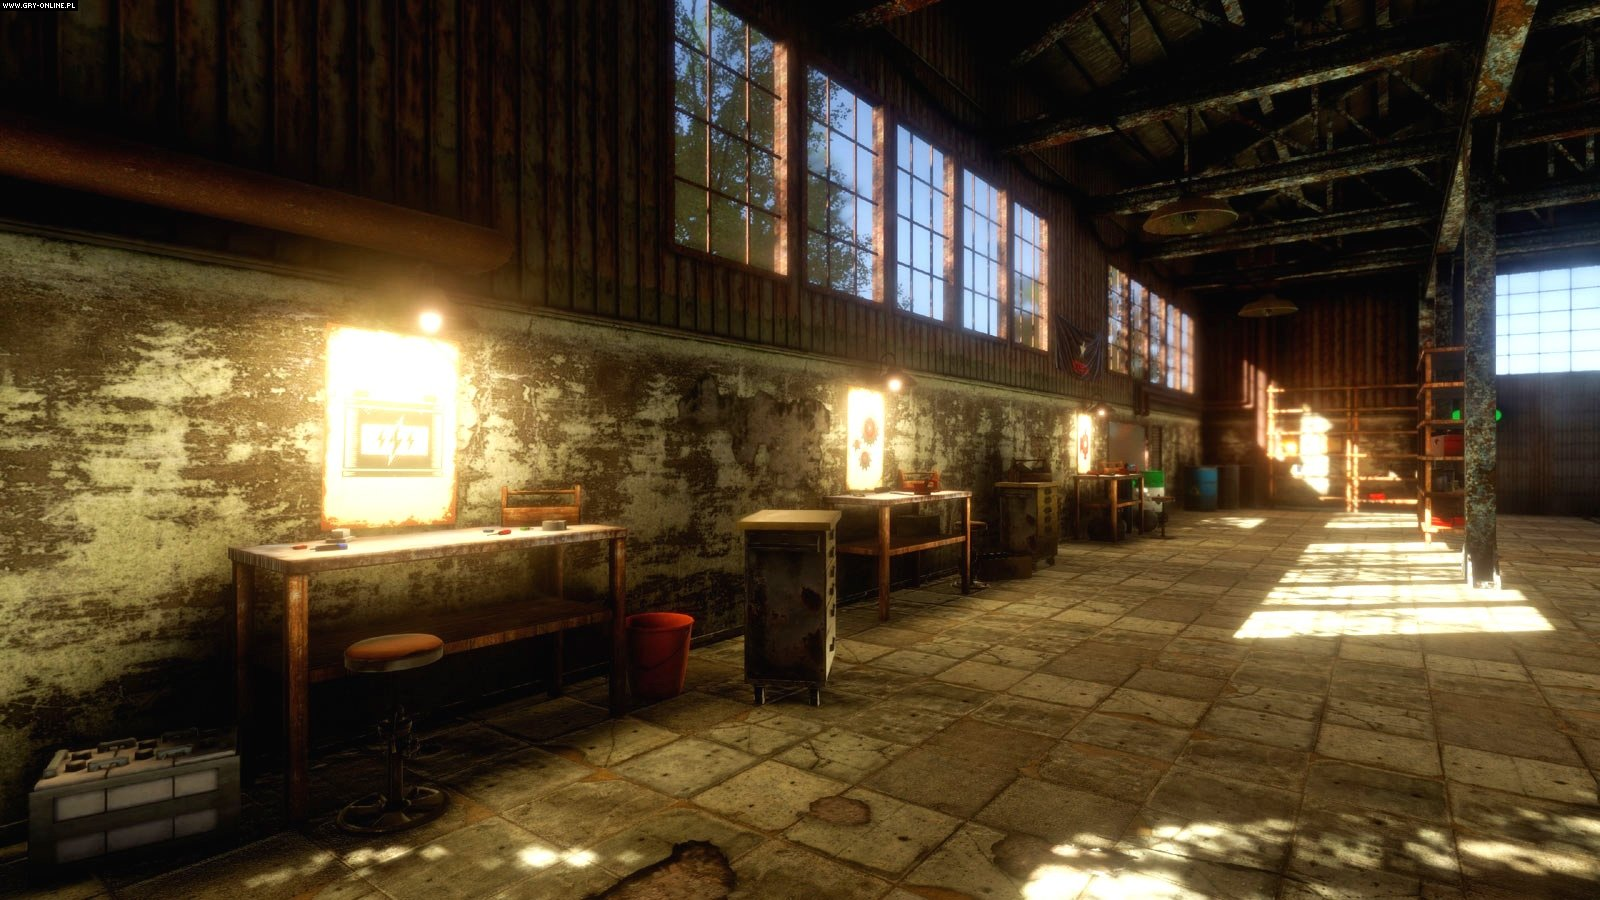 Train Mechanic Simulator 2017 PC Games Image 1/38, Si7 Studio, PlayWay